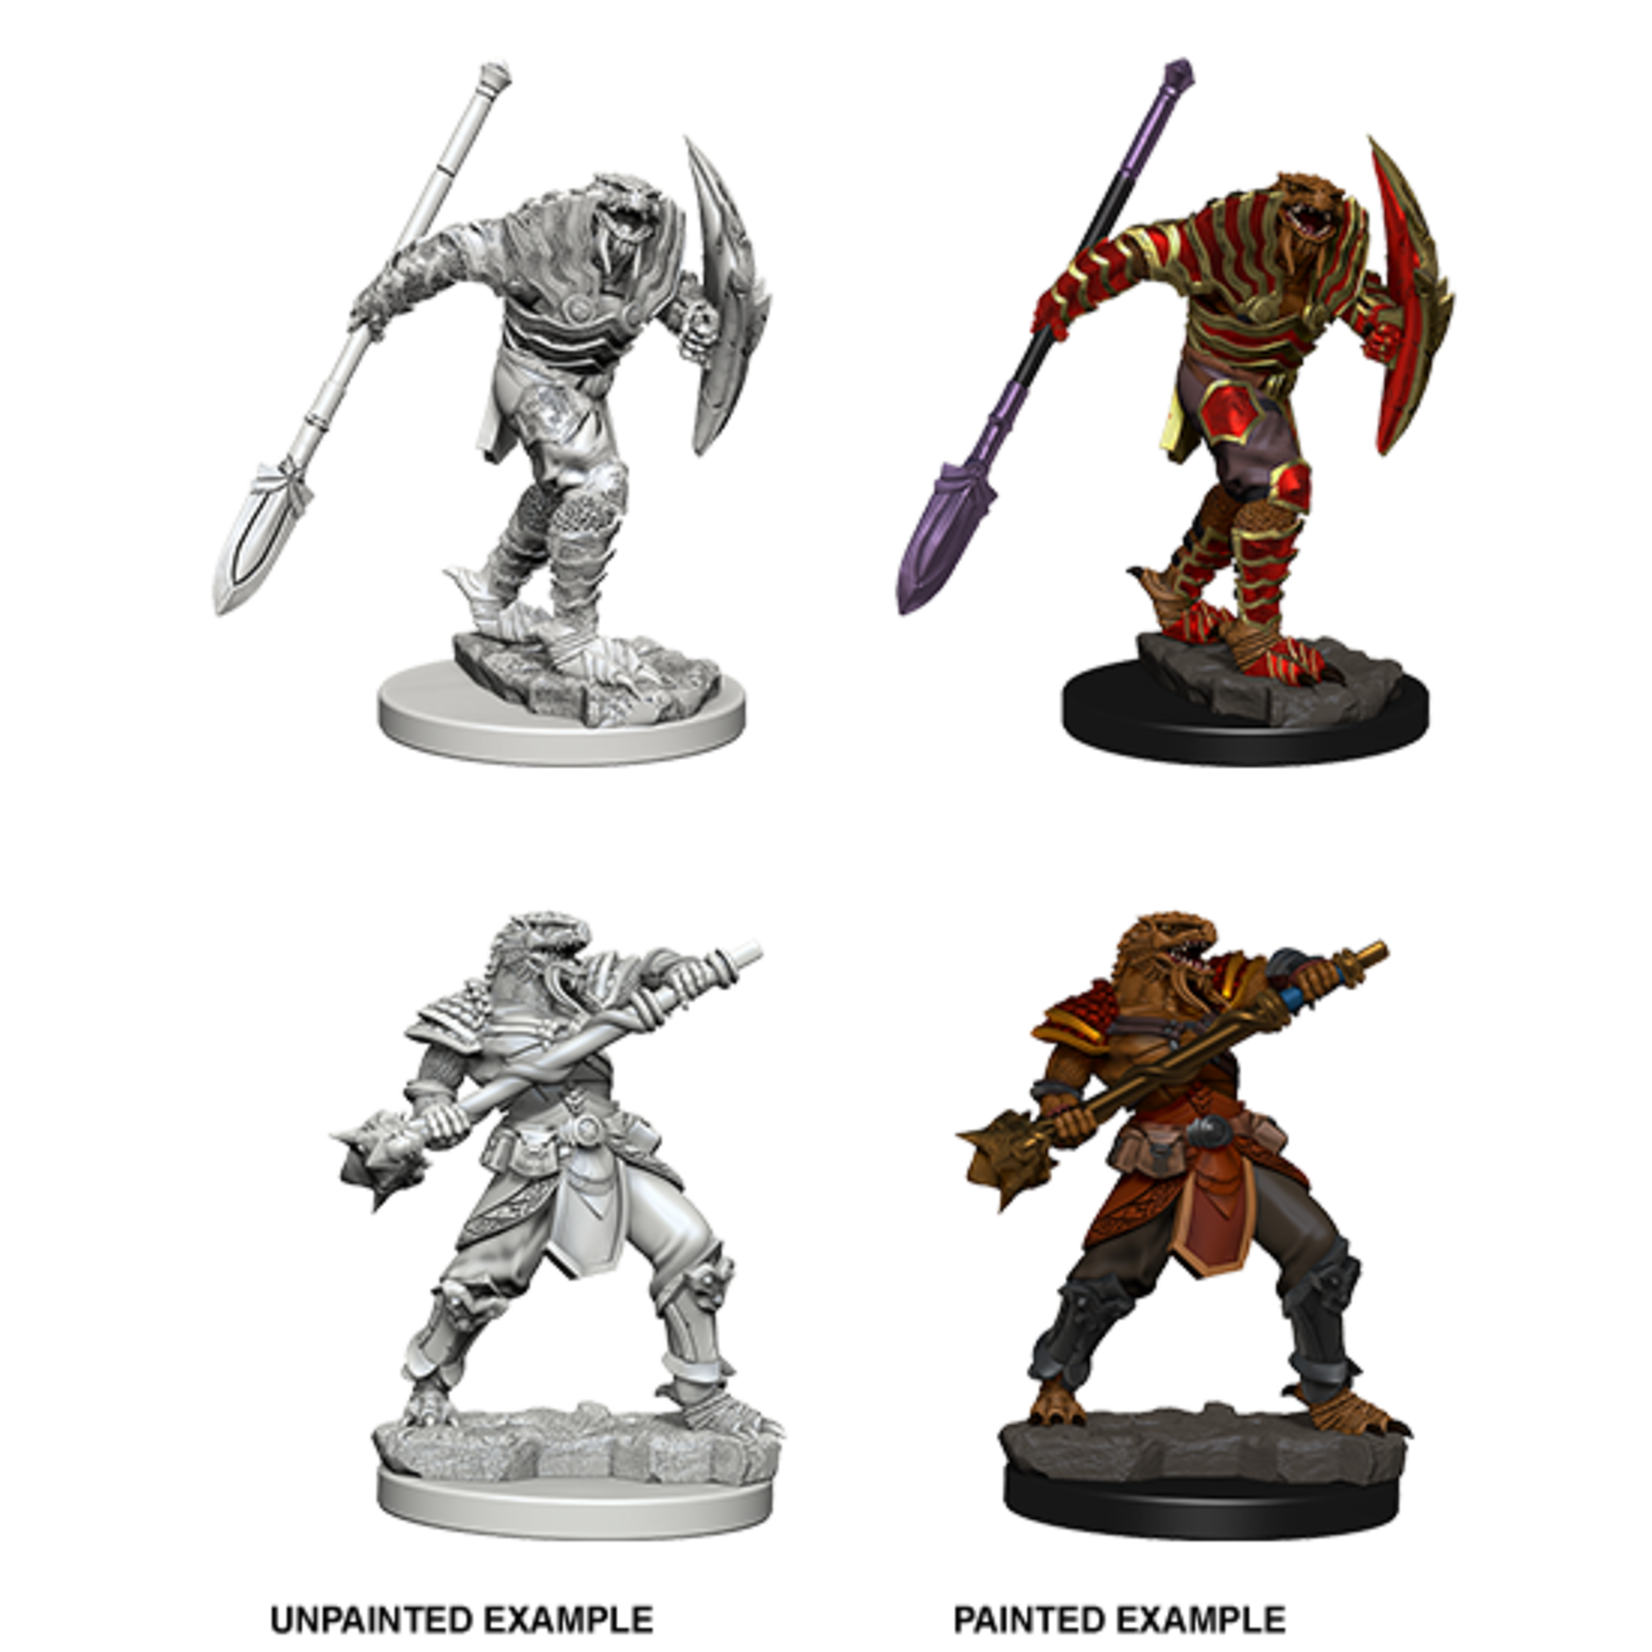 WizKids D&D Nolzur's Marvelous Miniatures: Dragonborn Fighter with Spear (W5)